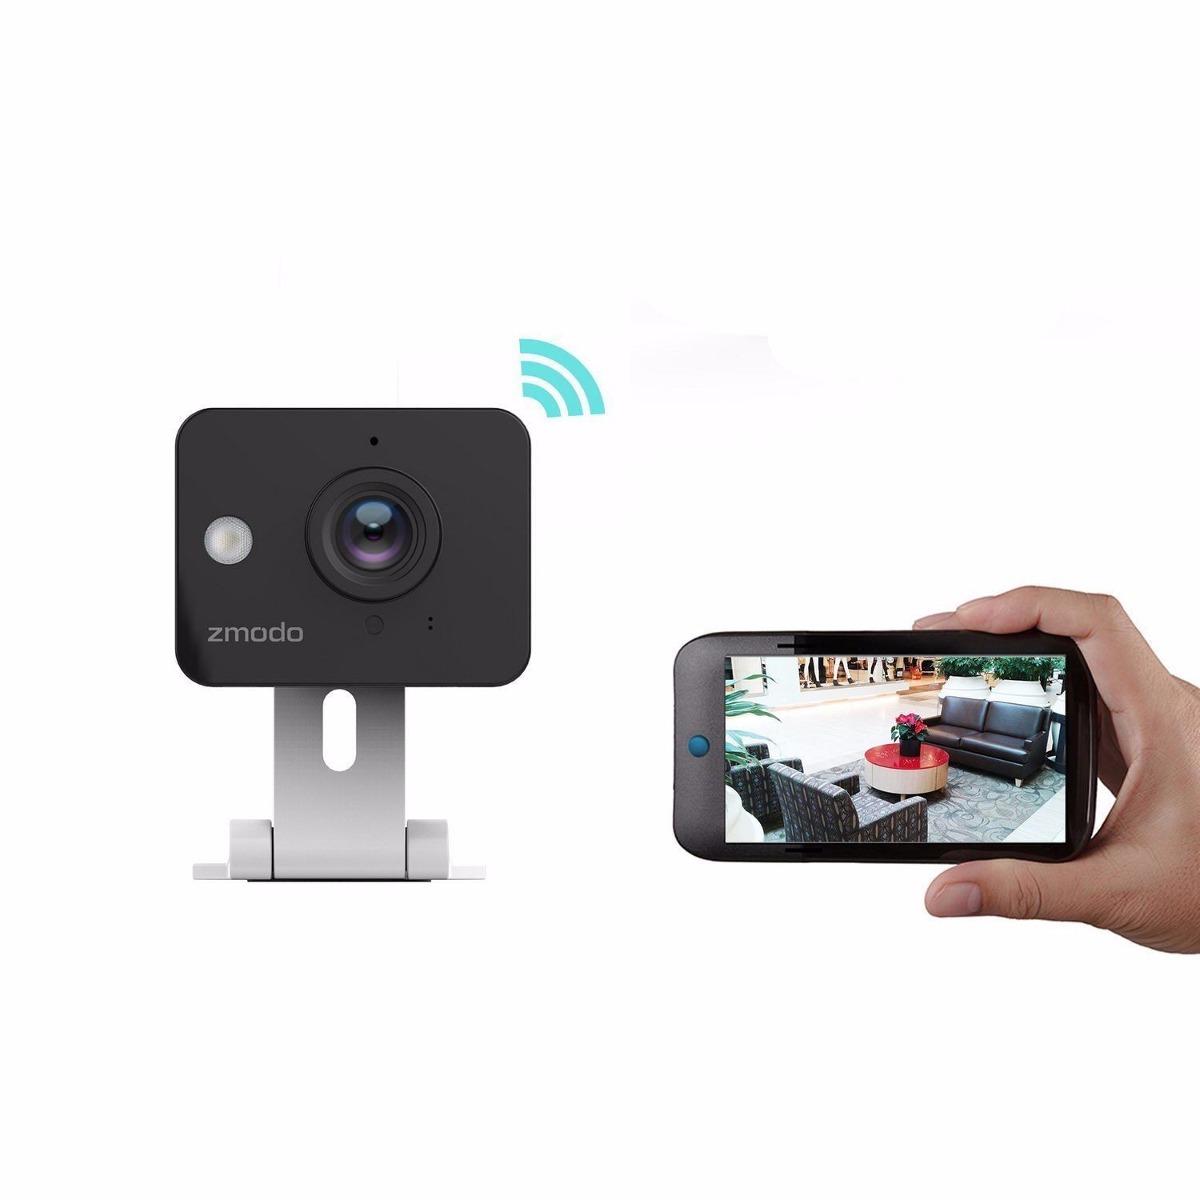 Camara Vigilancia Zmodo Android Iphone 720p Nocturna Wifi